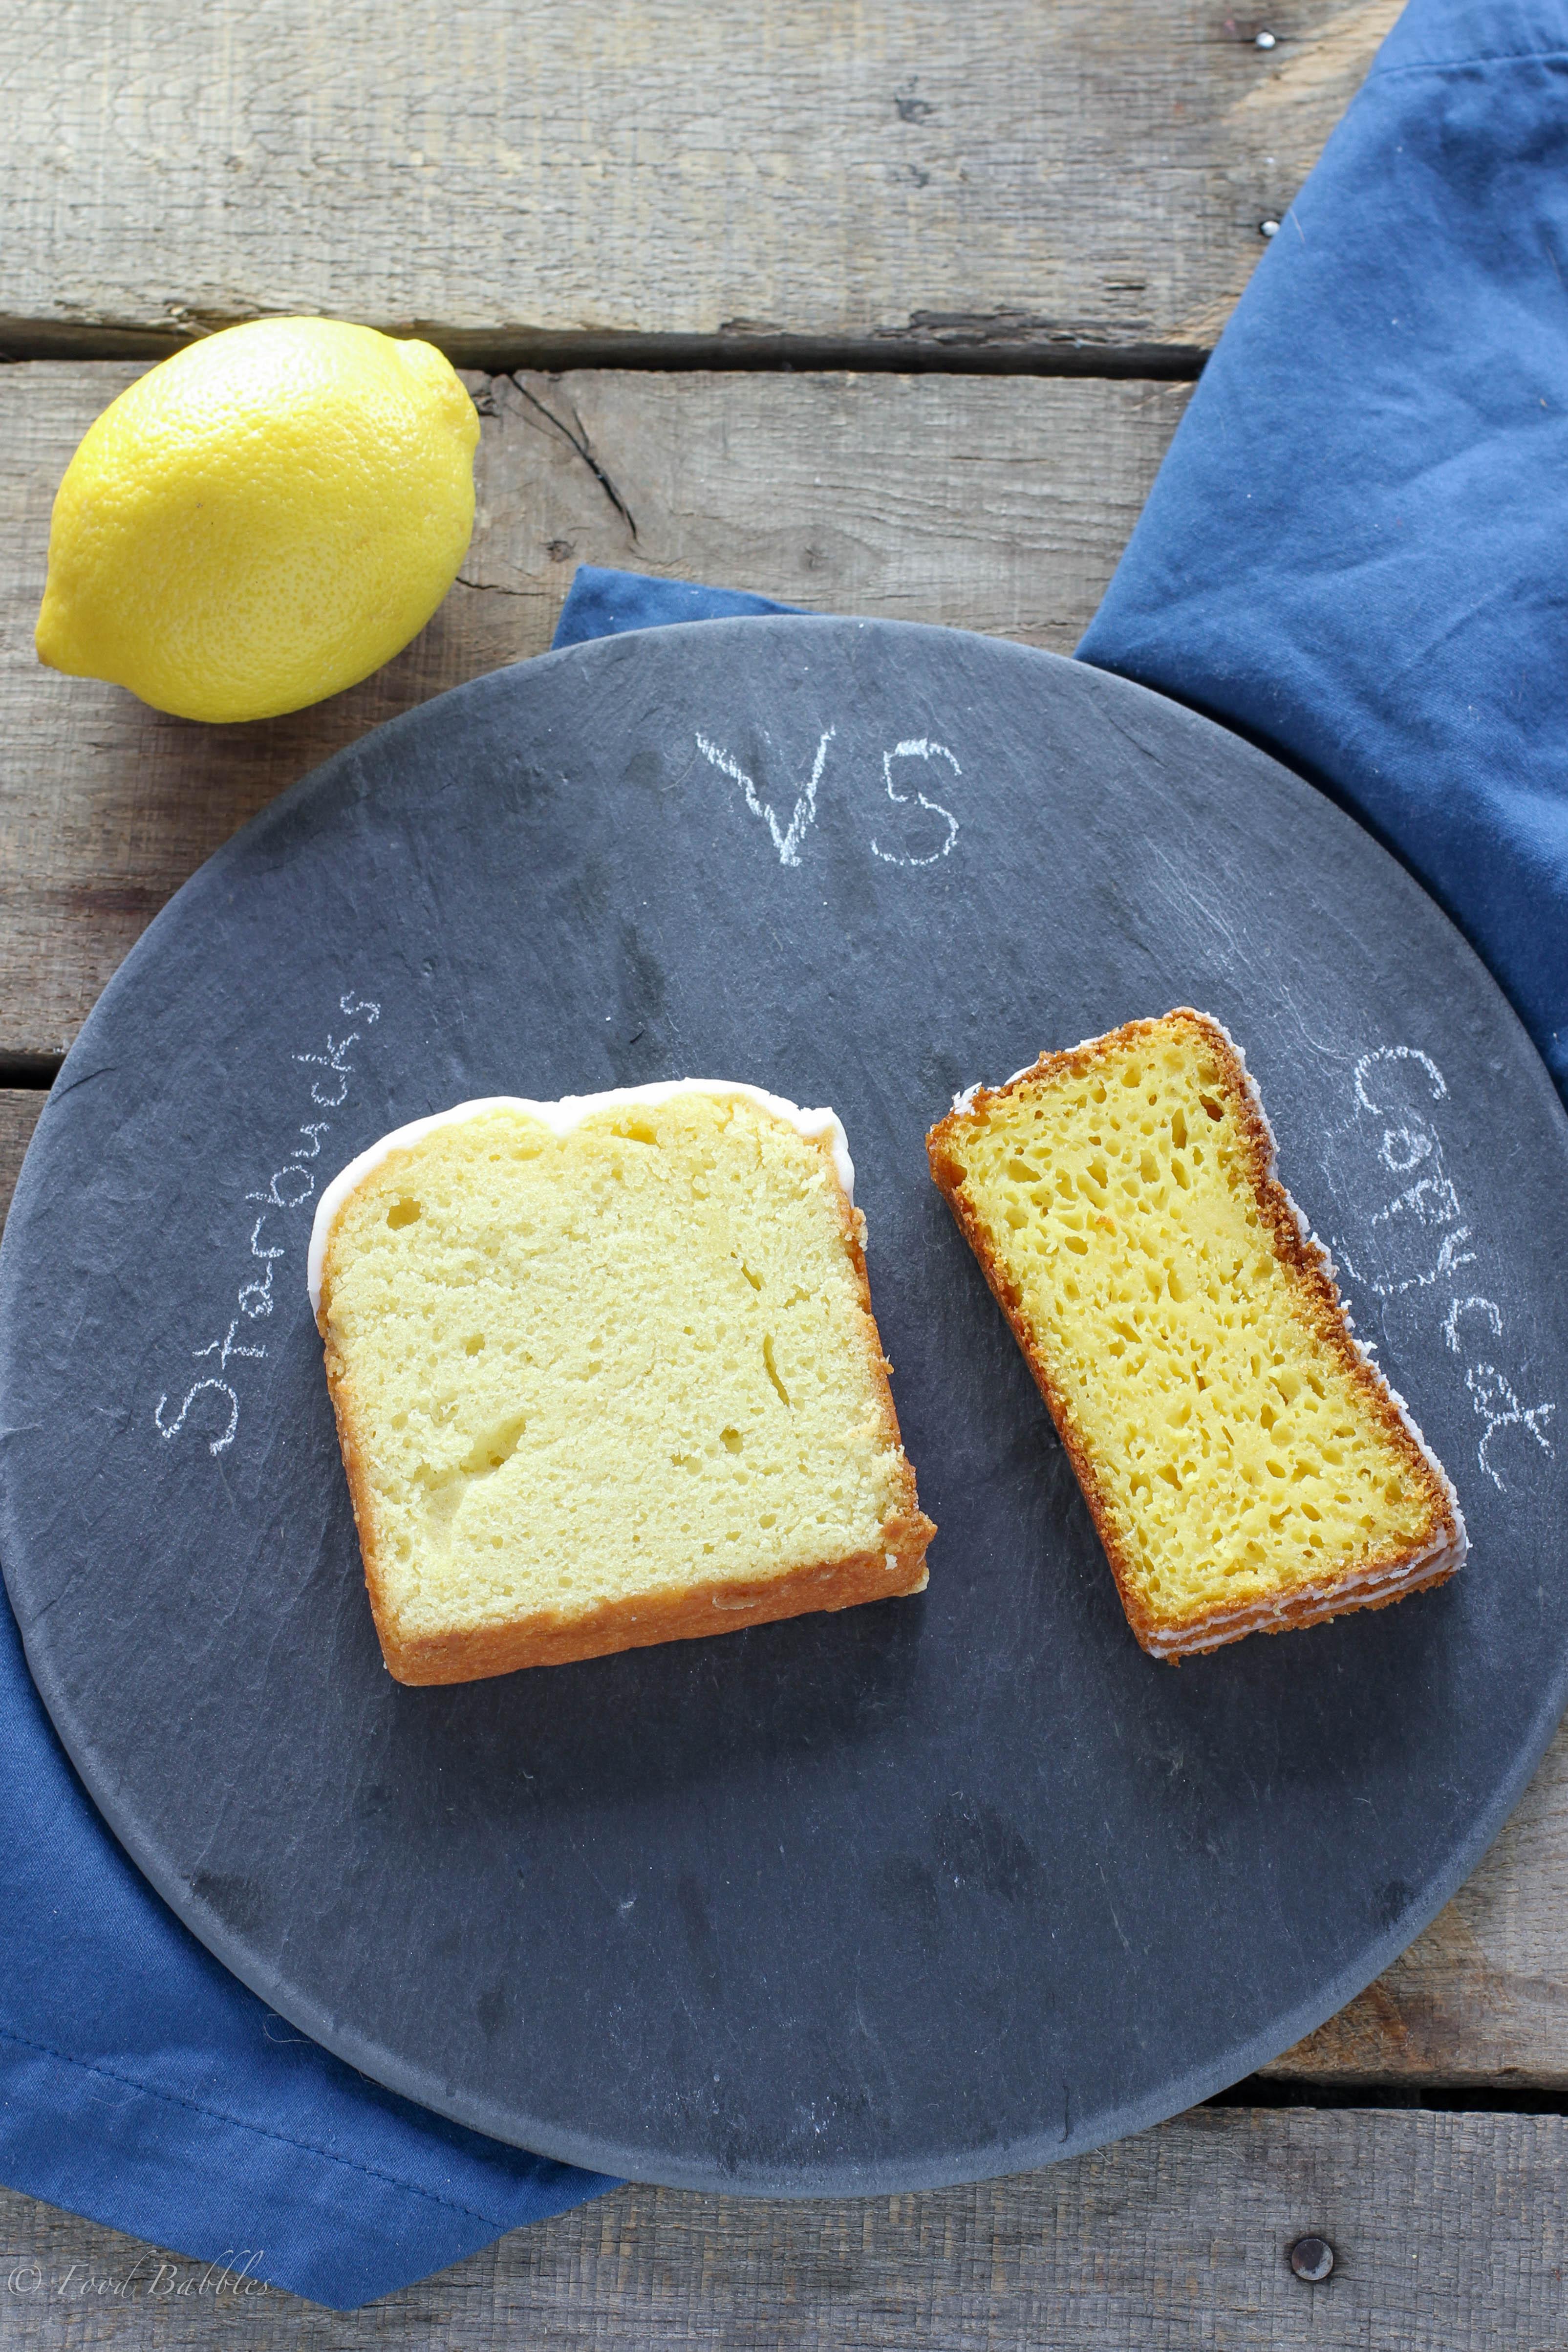 Munch Madness 2015 Starbucks Lemon Pound Cake Knuckle Salad